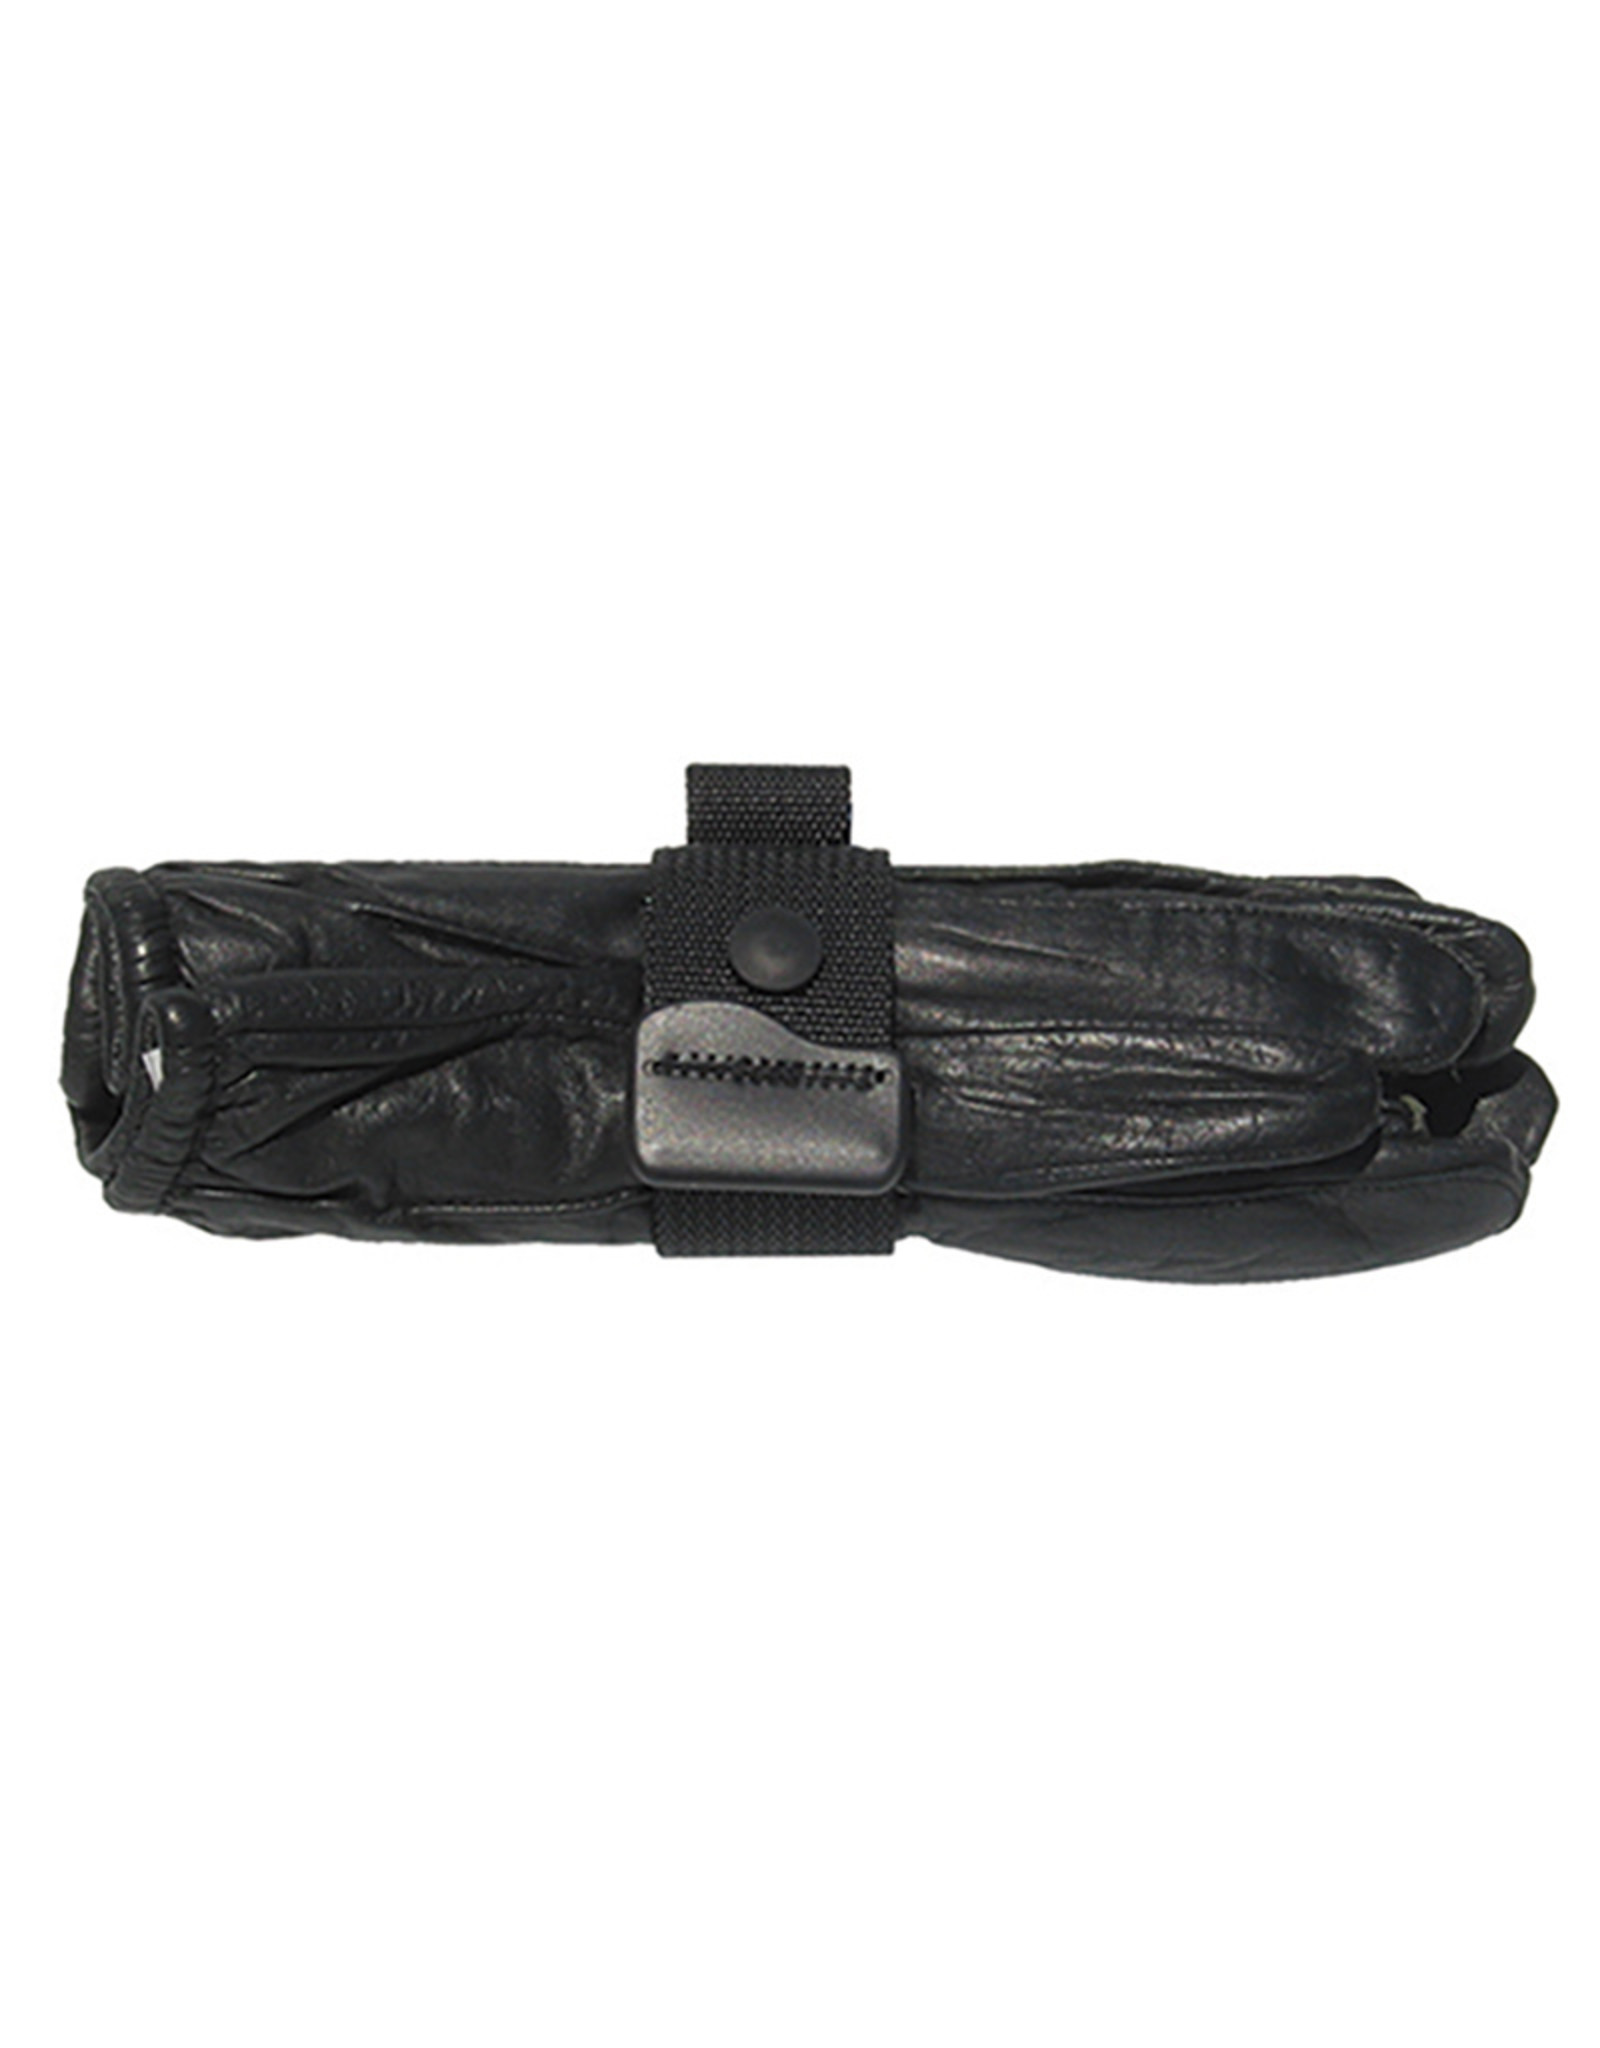 HI-TEC INTERVENTION HORIZONTAL Leather Glove carrier - HT803